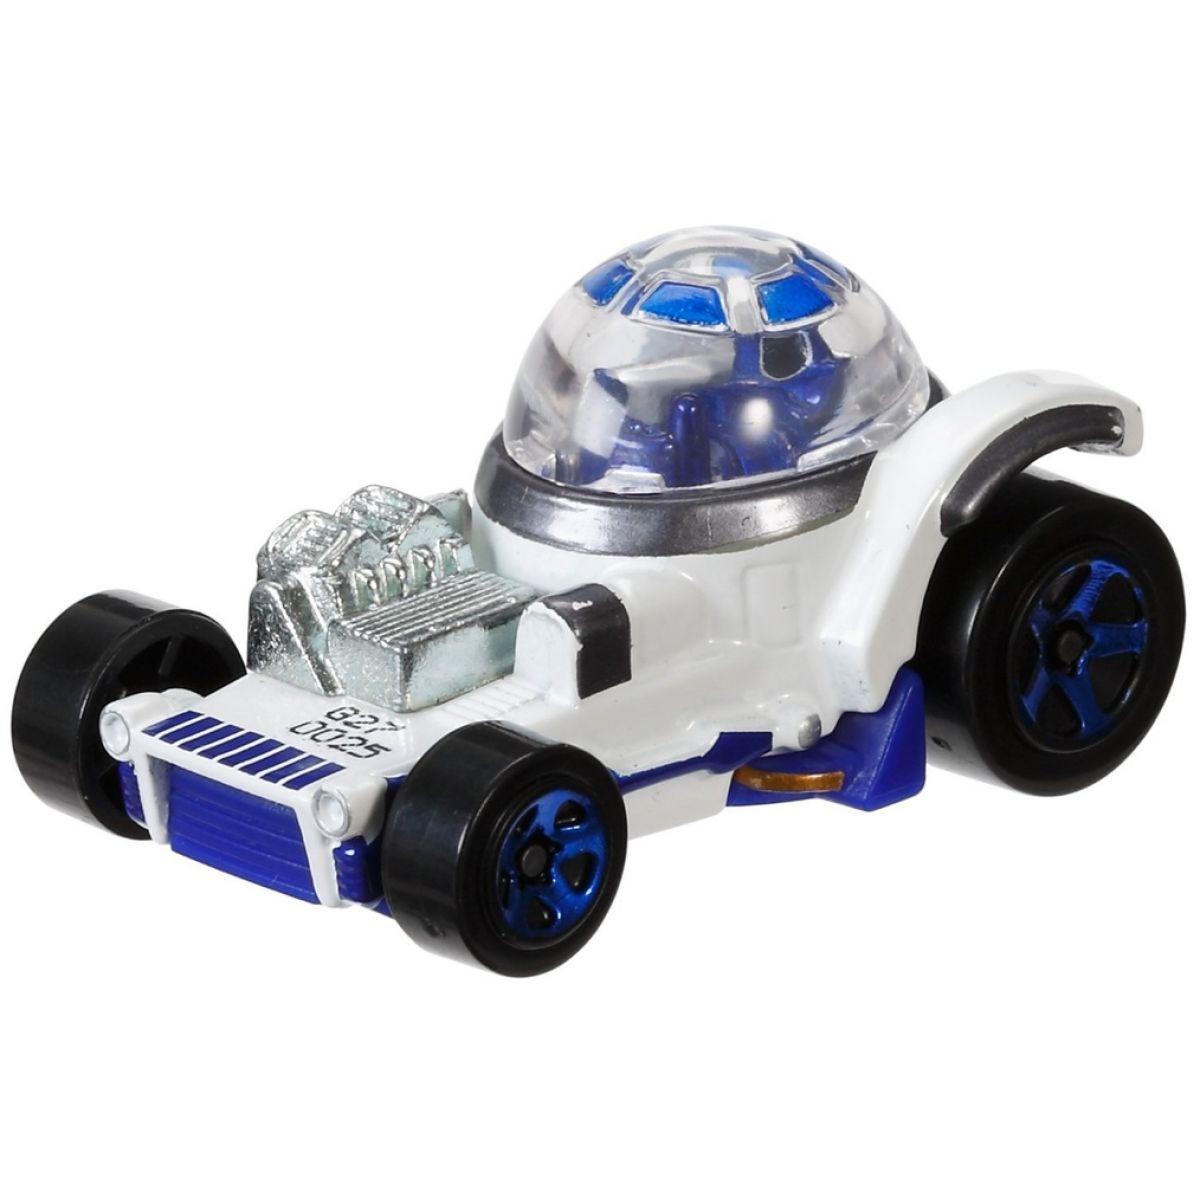 Hot Wheels Star Wars Character cars angličák - R2-D2 DXP42